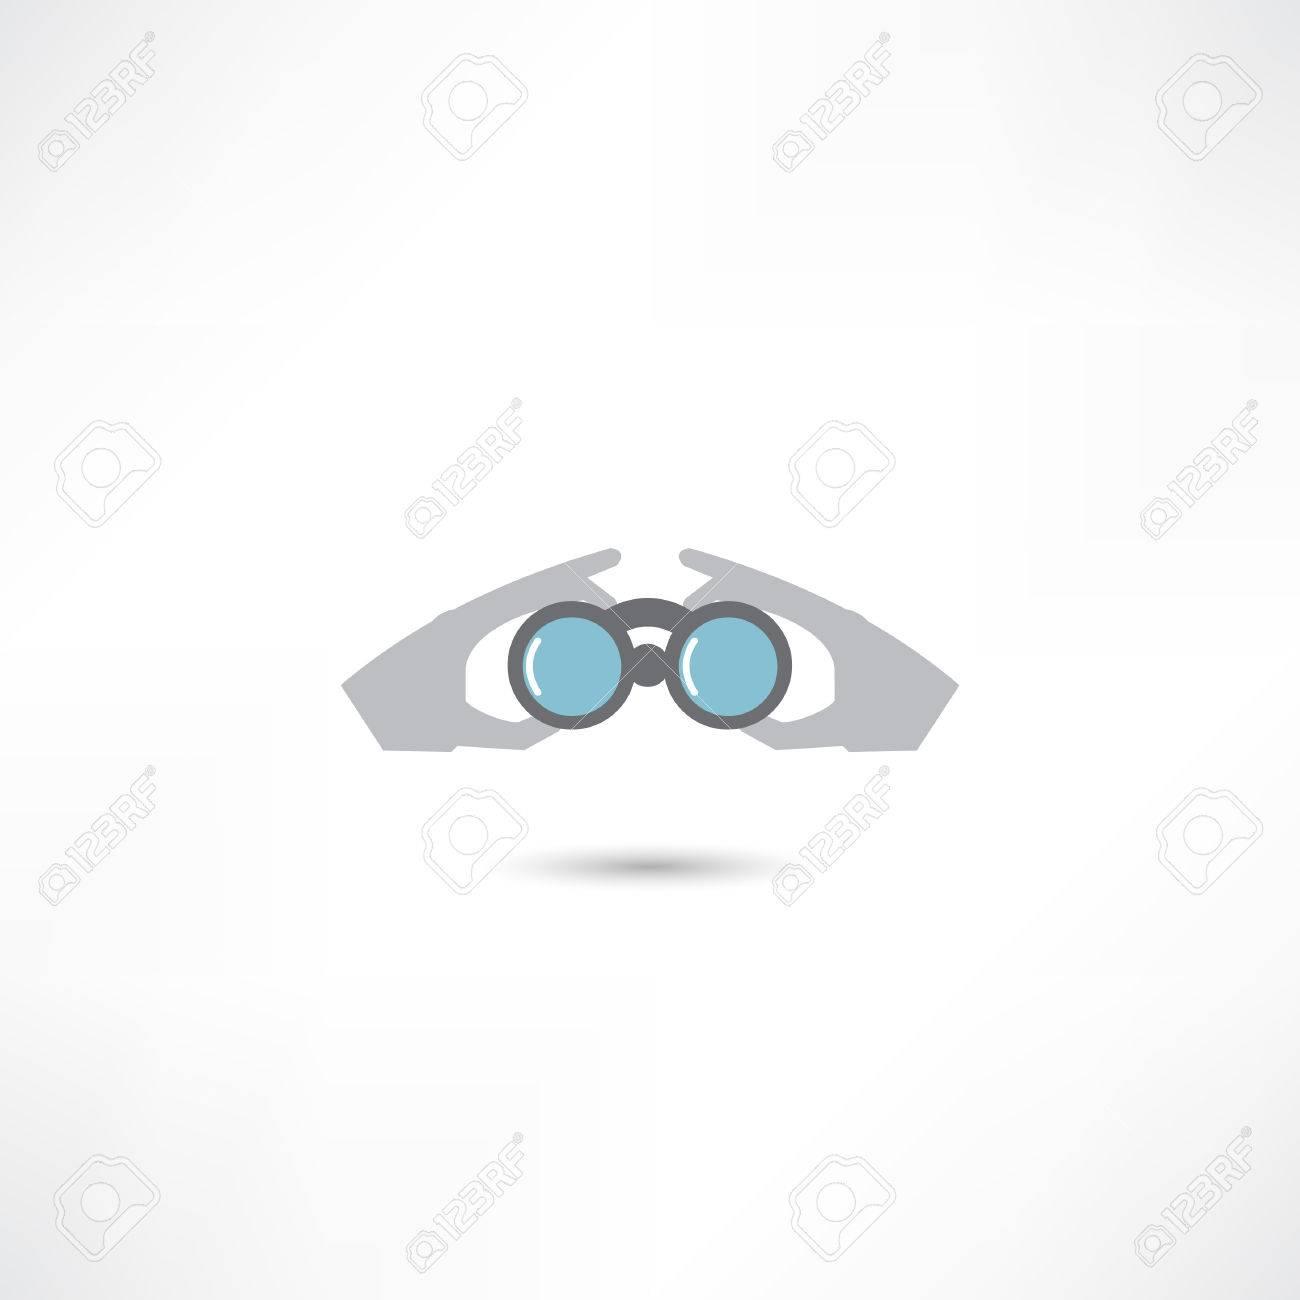 binoculars icon - 32210181